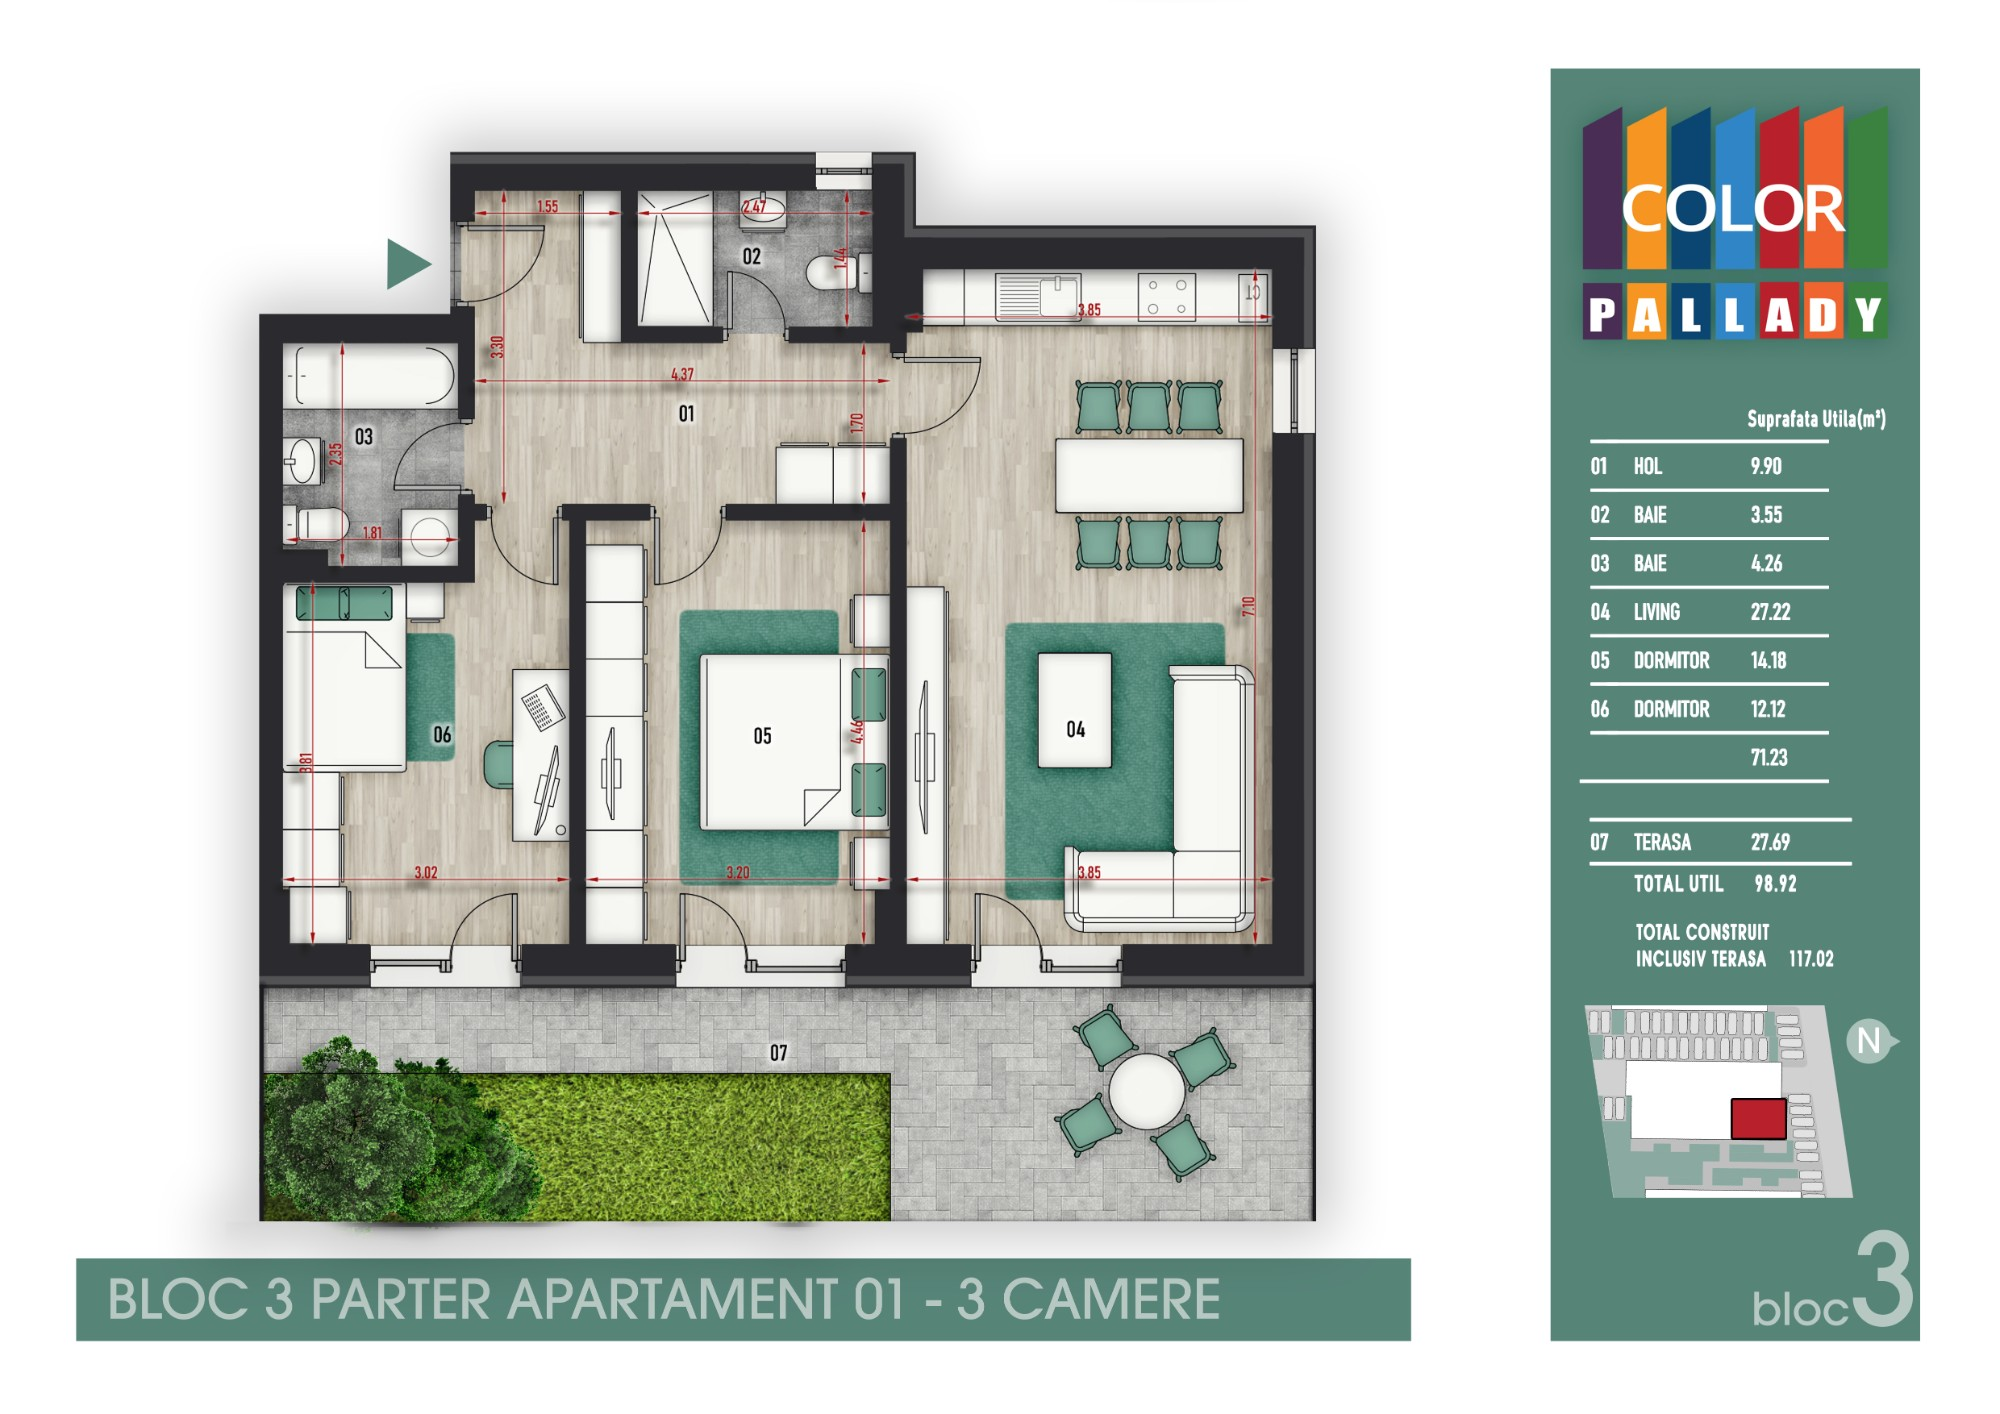 Bloc 3 - Parter - Apartament 01